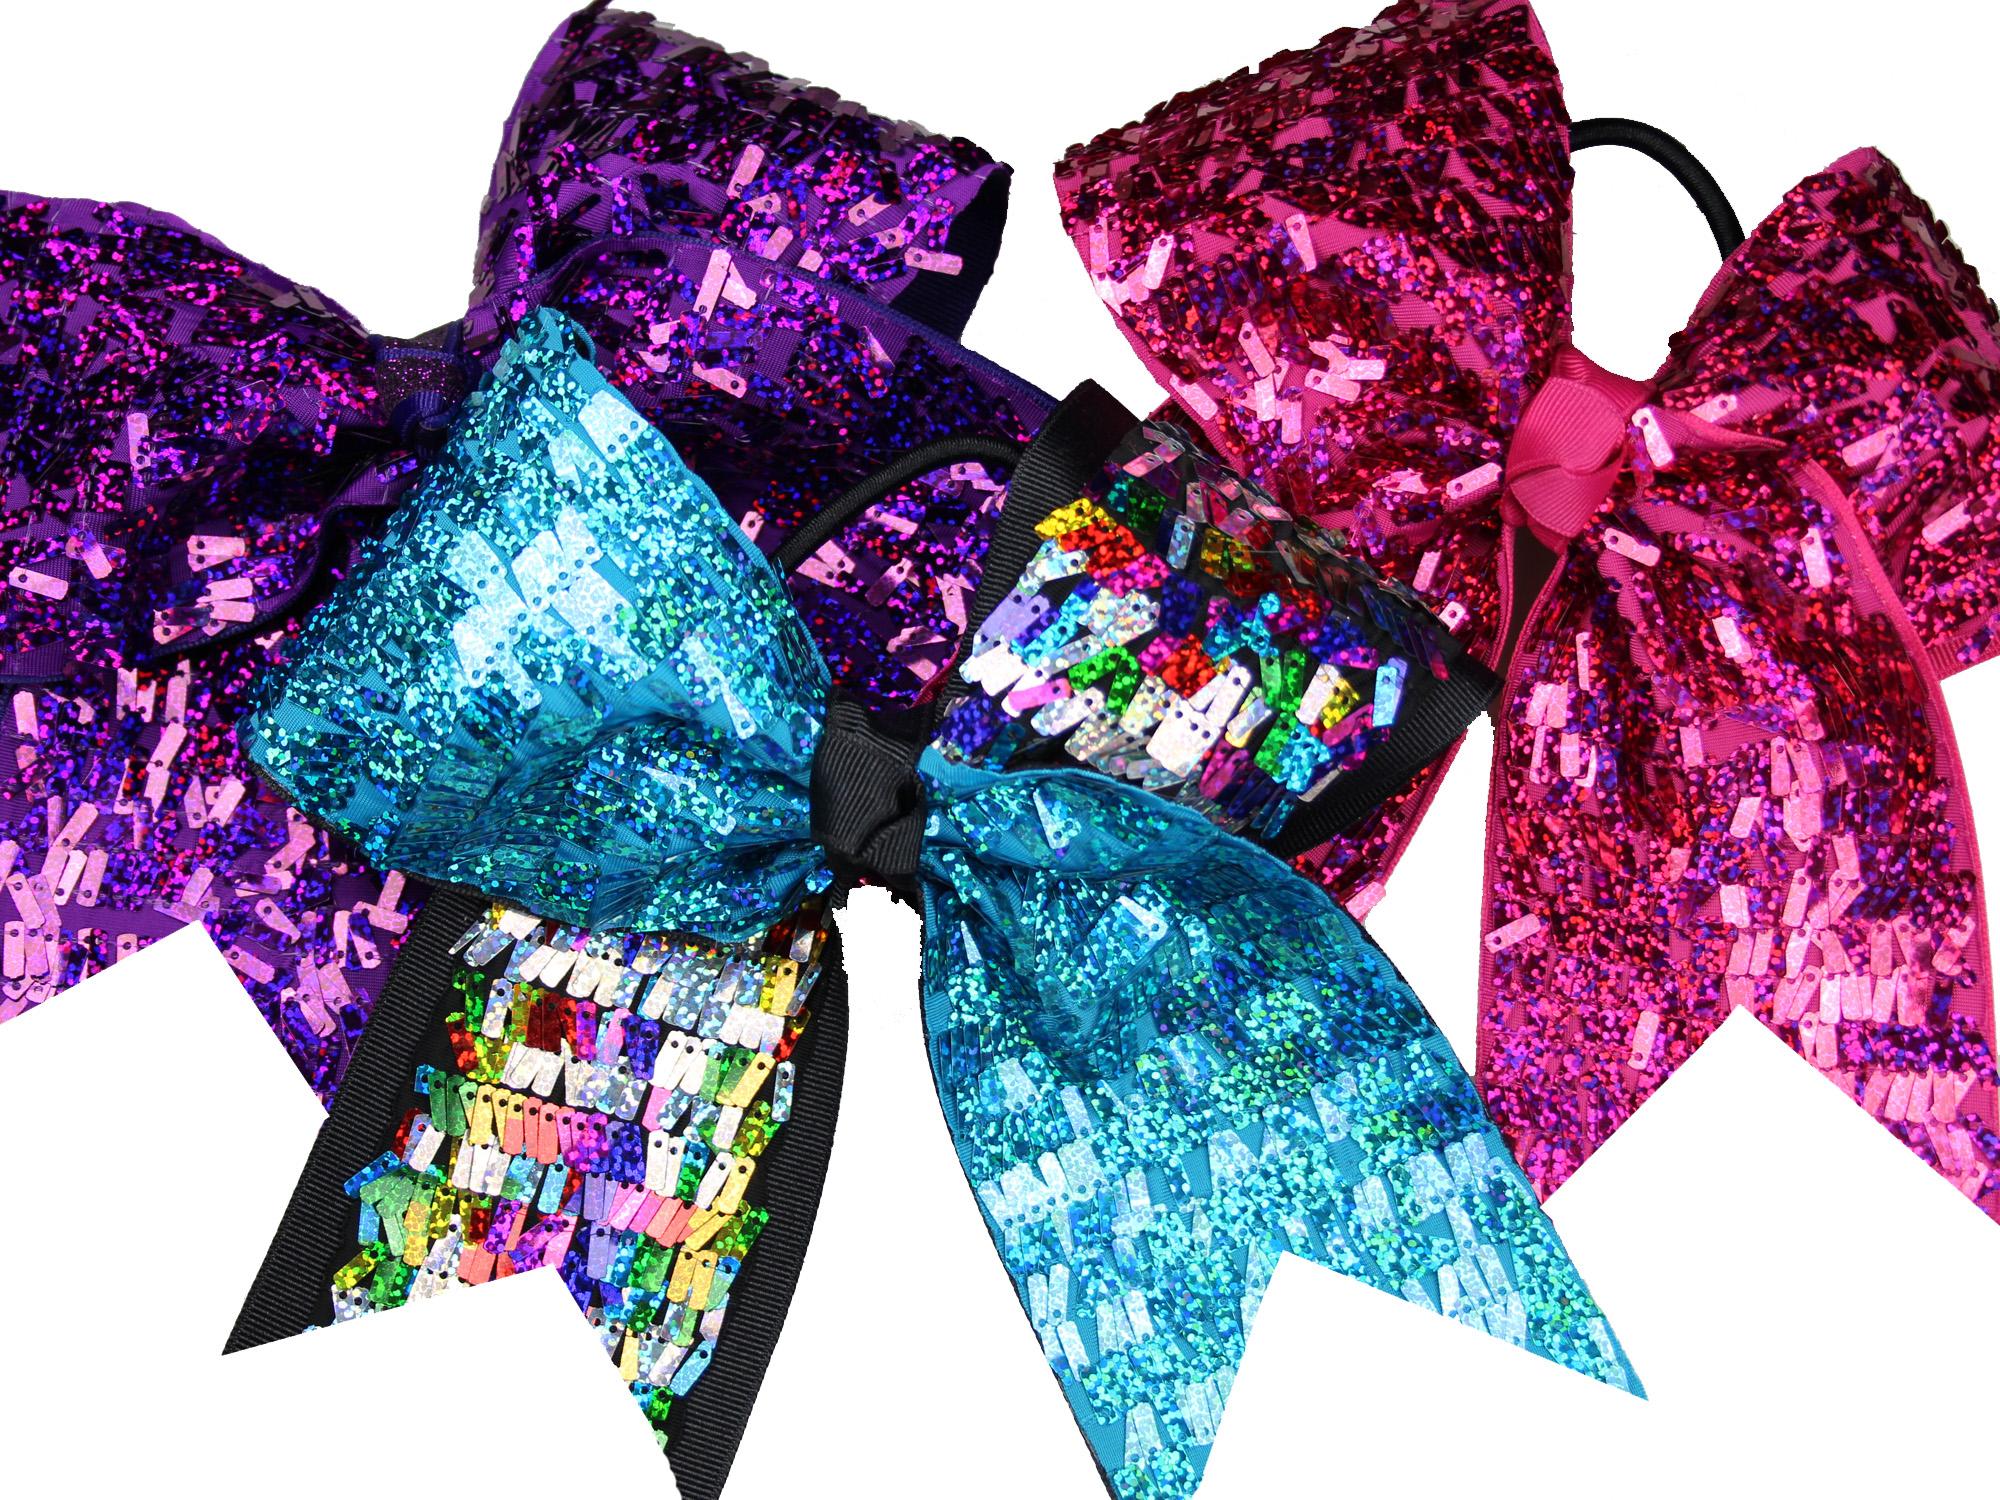 Cute cheer wallpapers wallpapersafari - Cute cheer bows ...